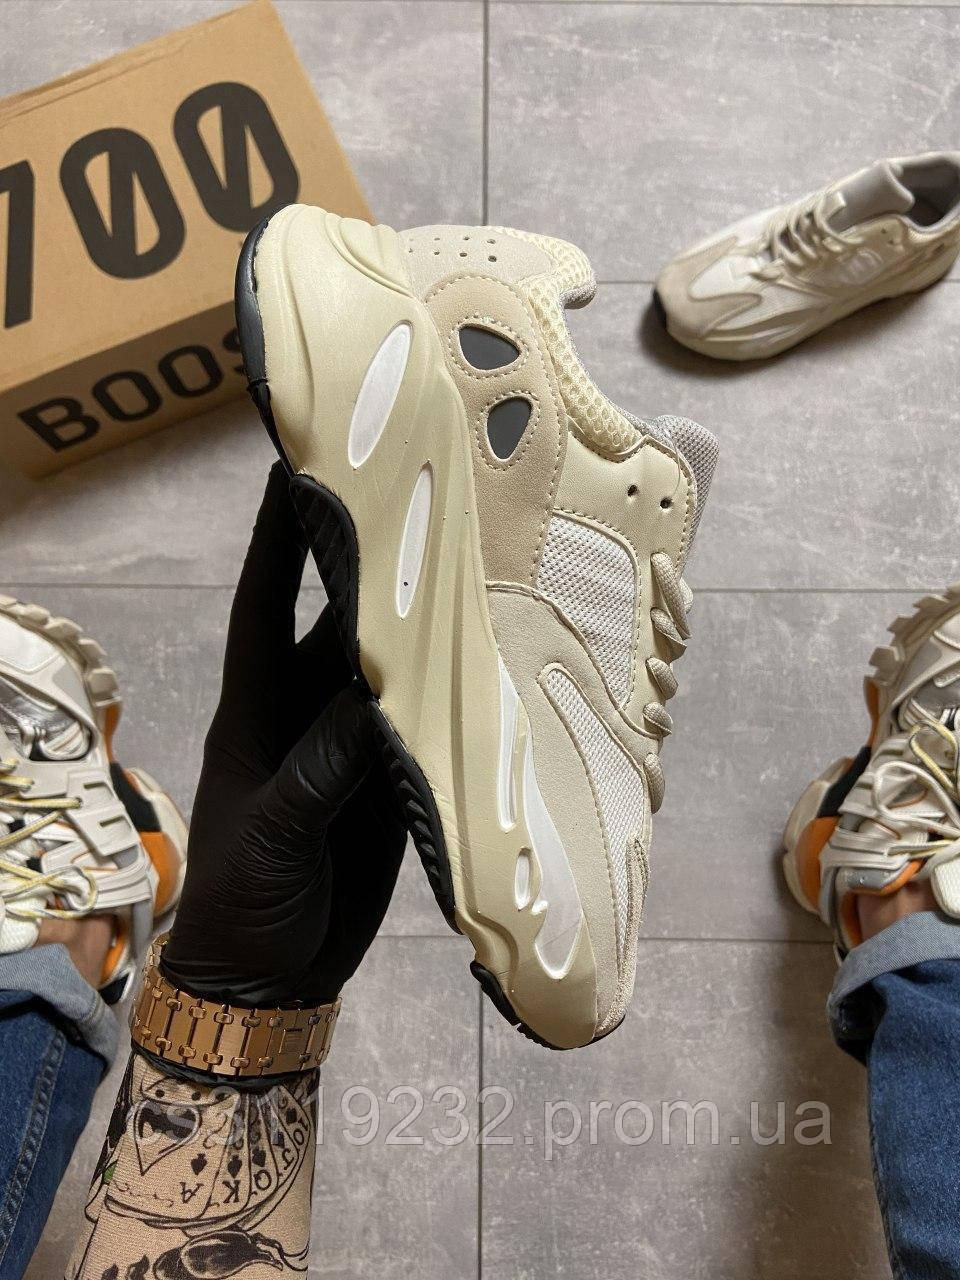 Женские кроссовки Adidas Yeezy Boost 700 Analog Beige (бежевые)